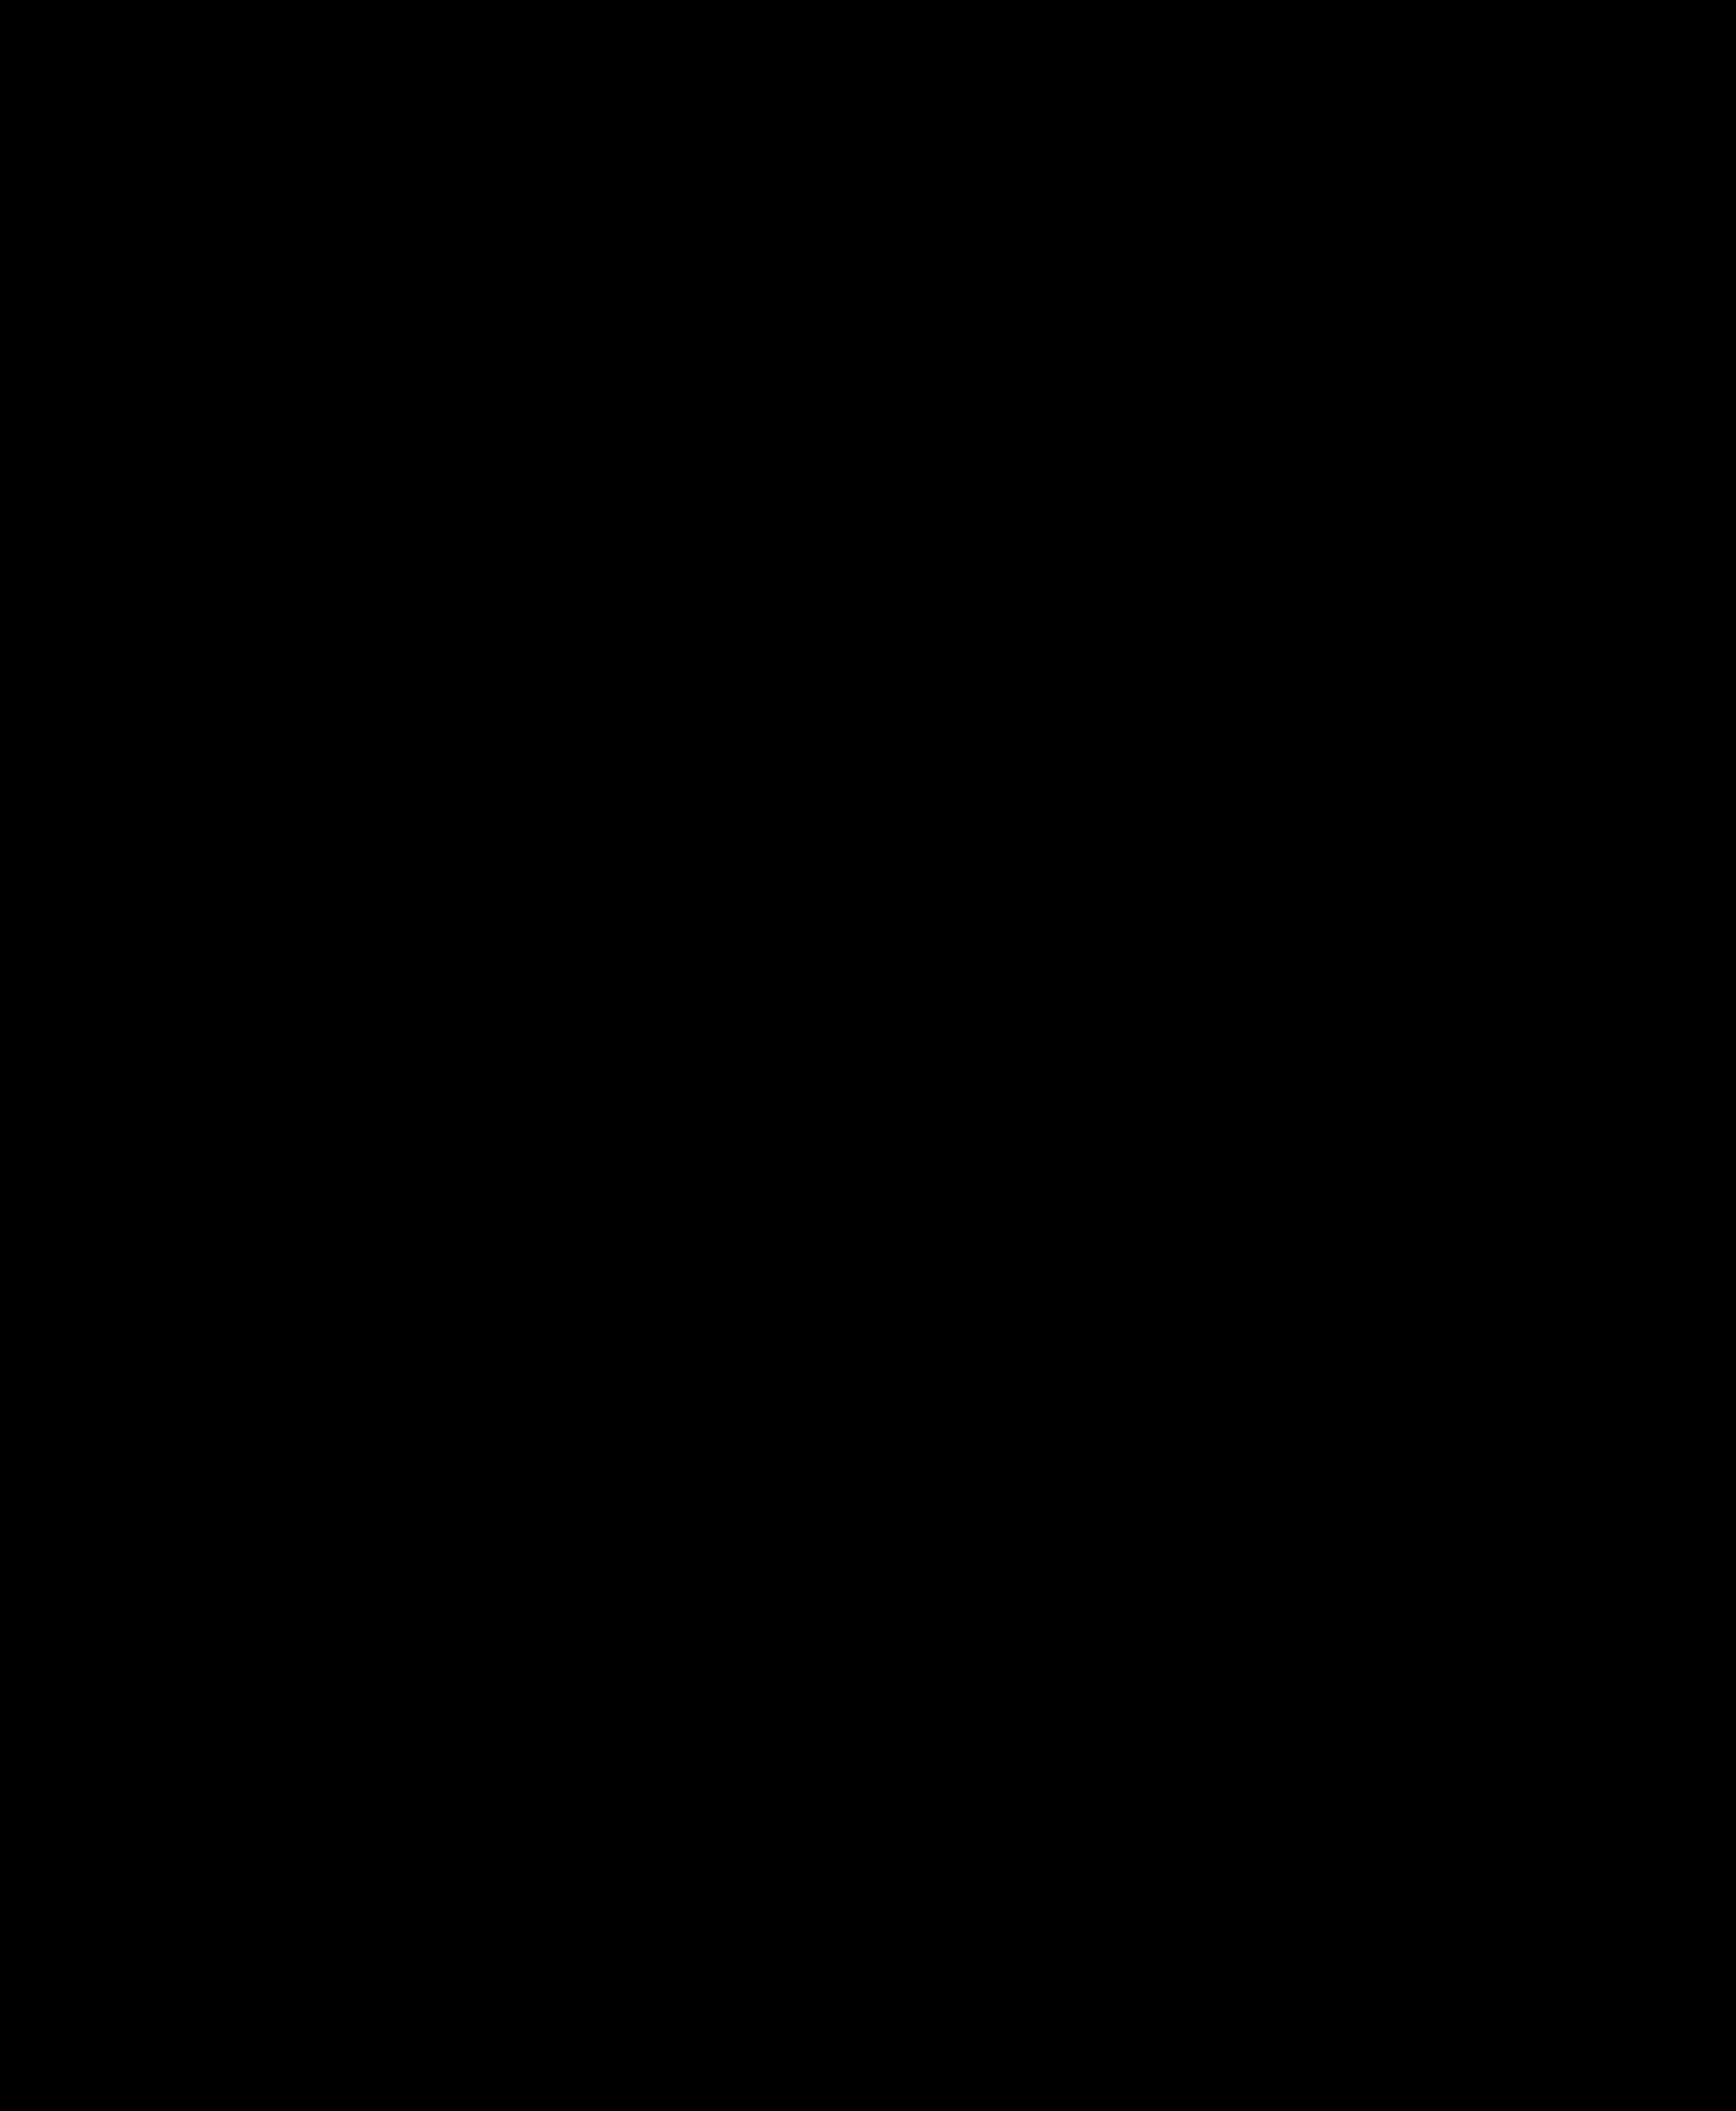 Clipart - Dancing man silhouette